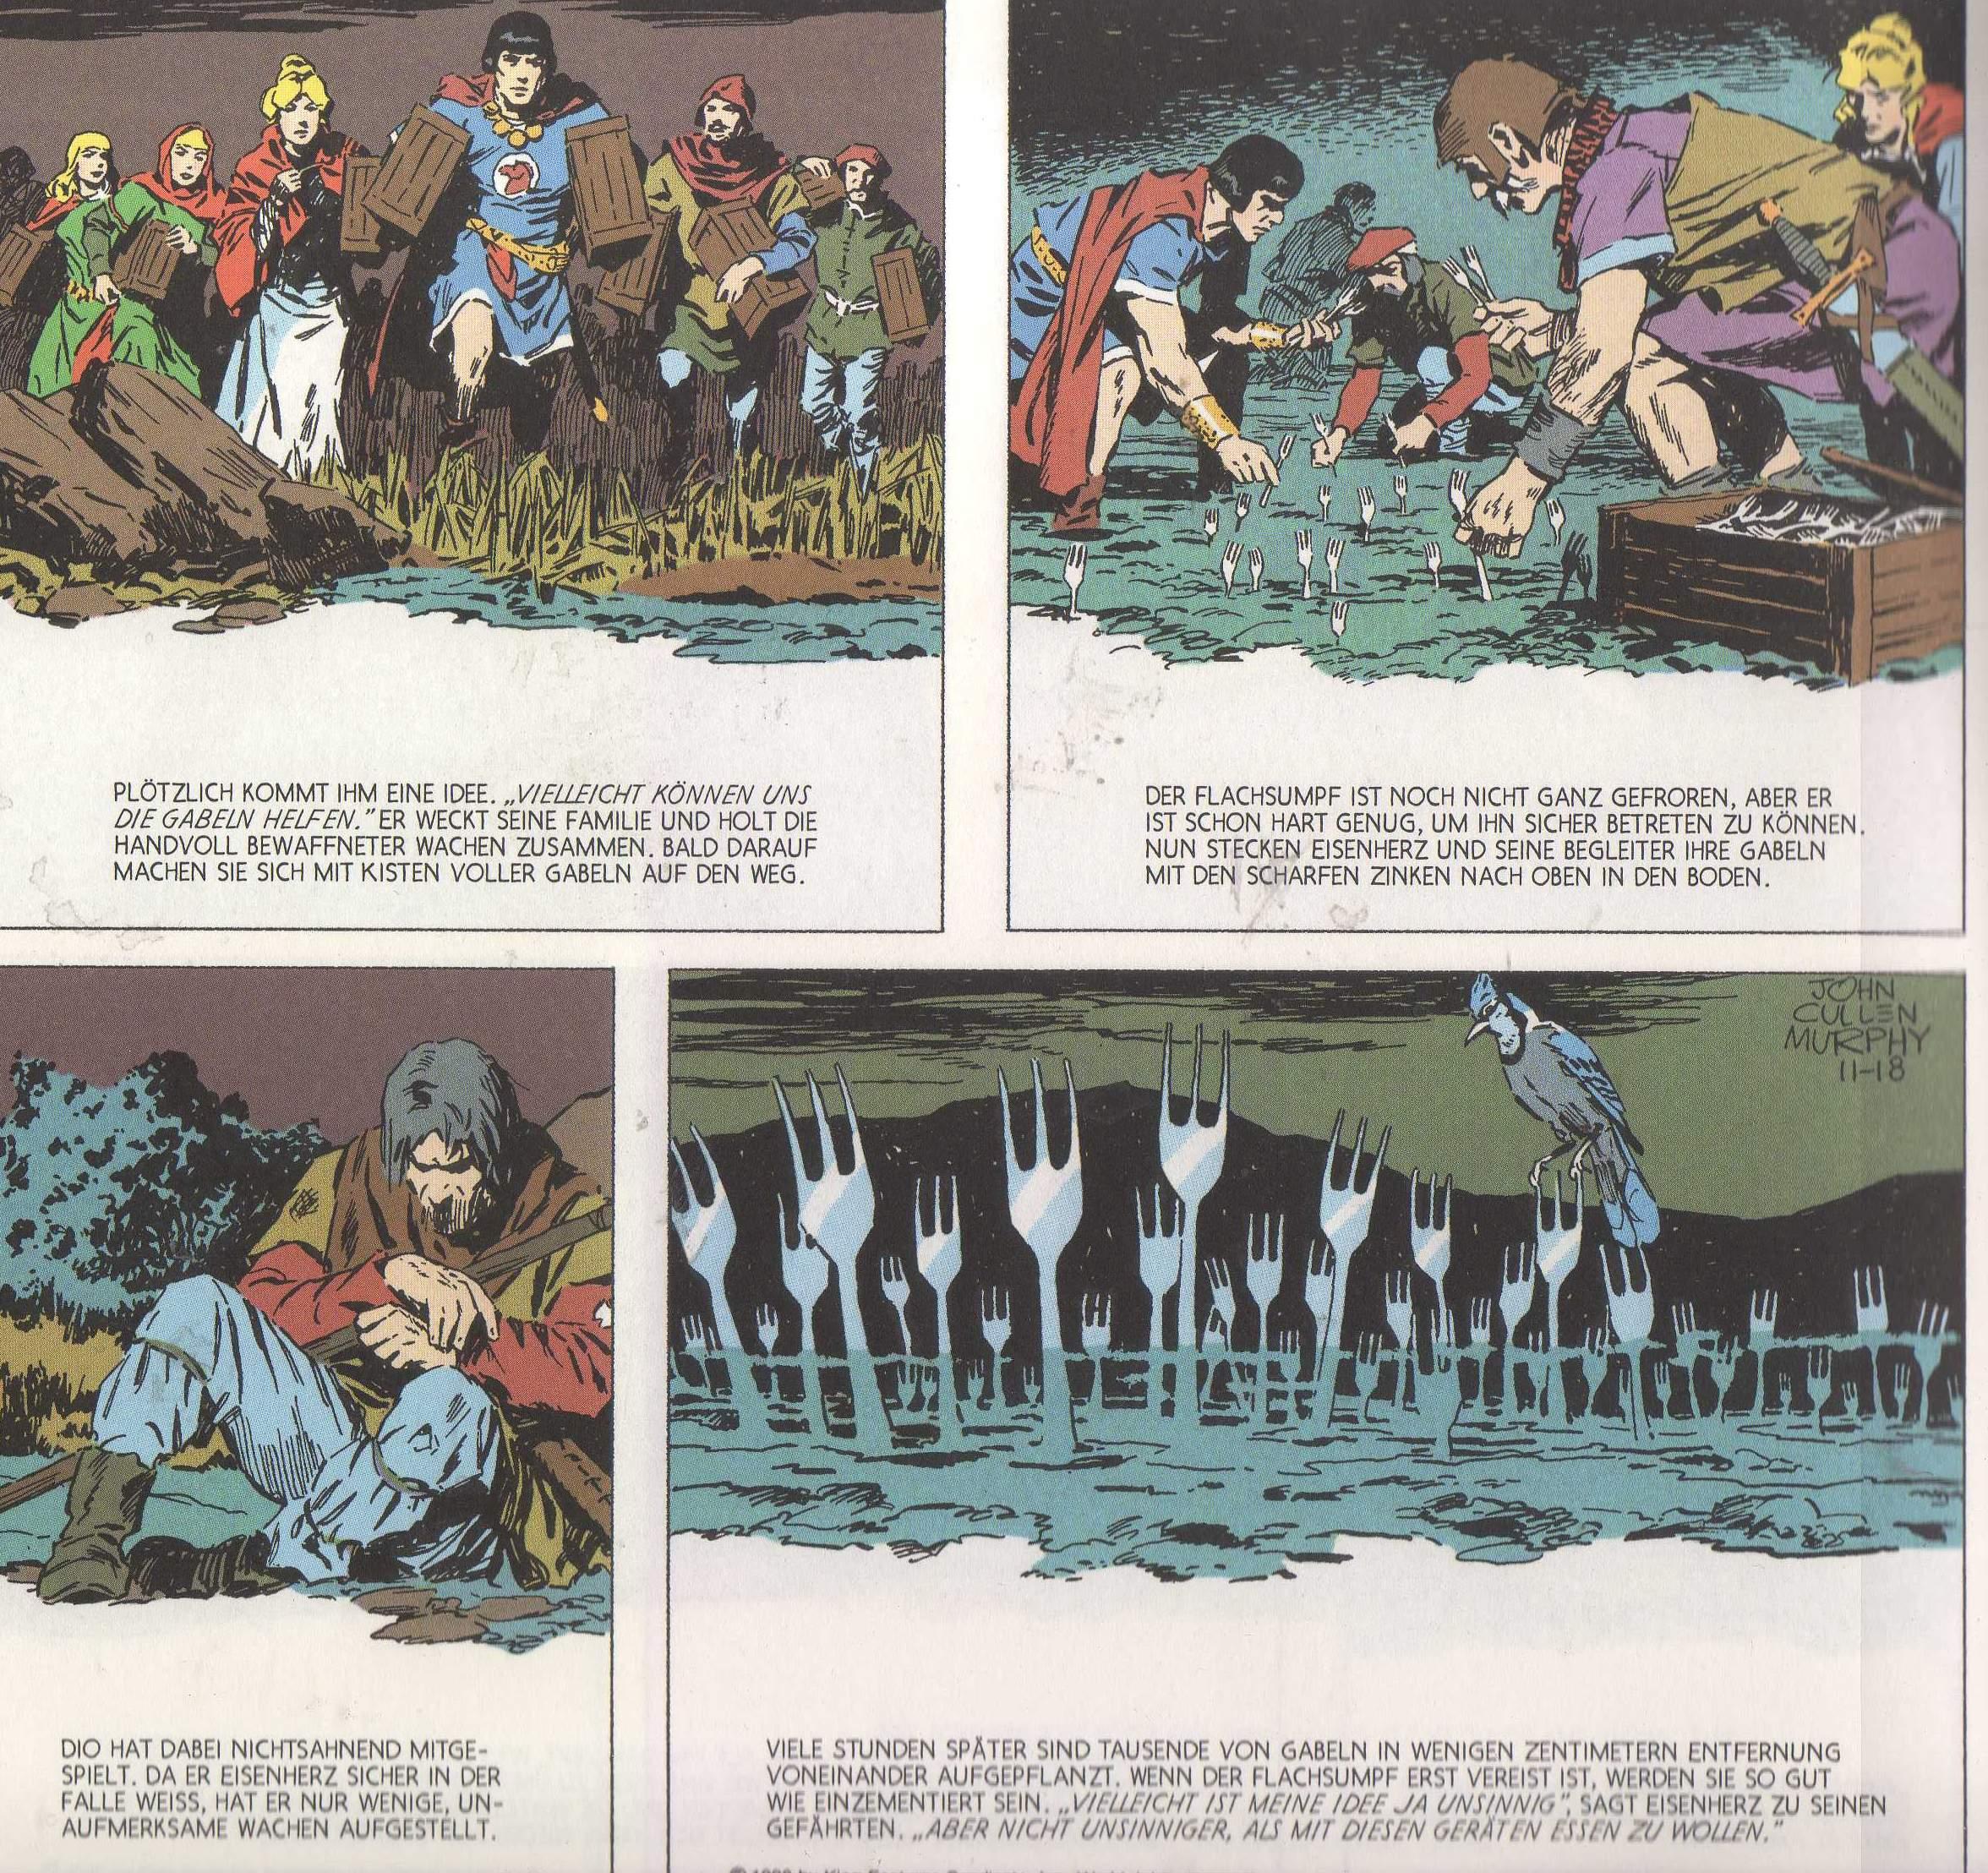 Kochschule comic  Prinz Eisenherz, Jahrgang 1989/1990 - HIGHLIGHTZONE